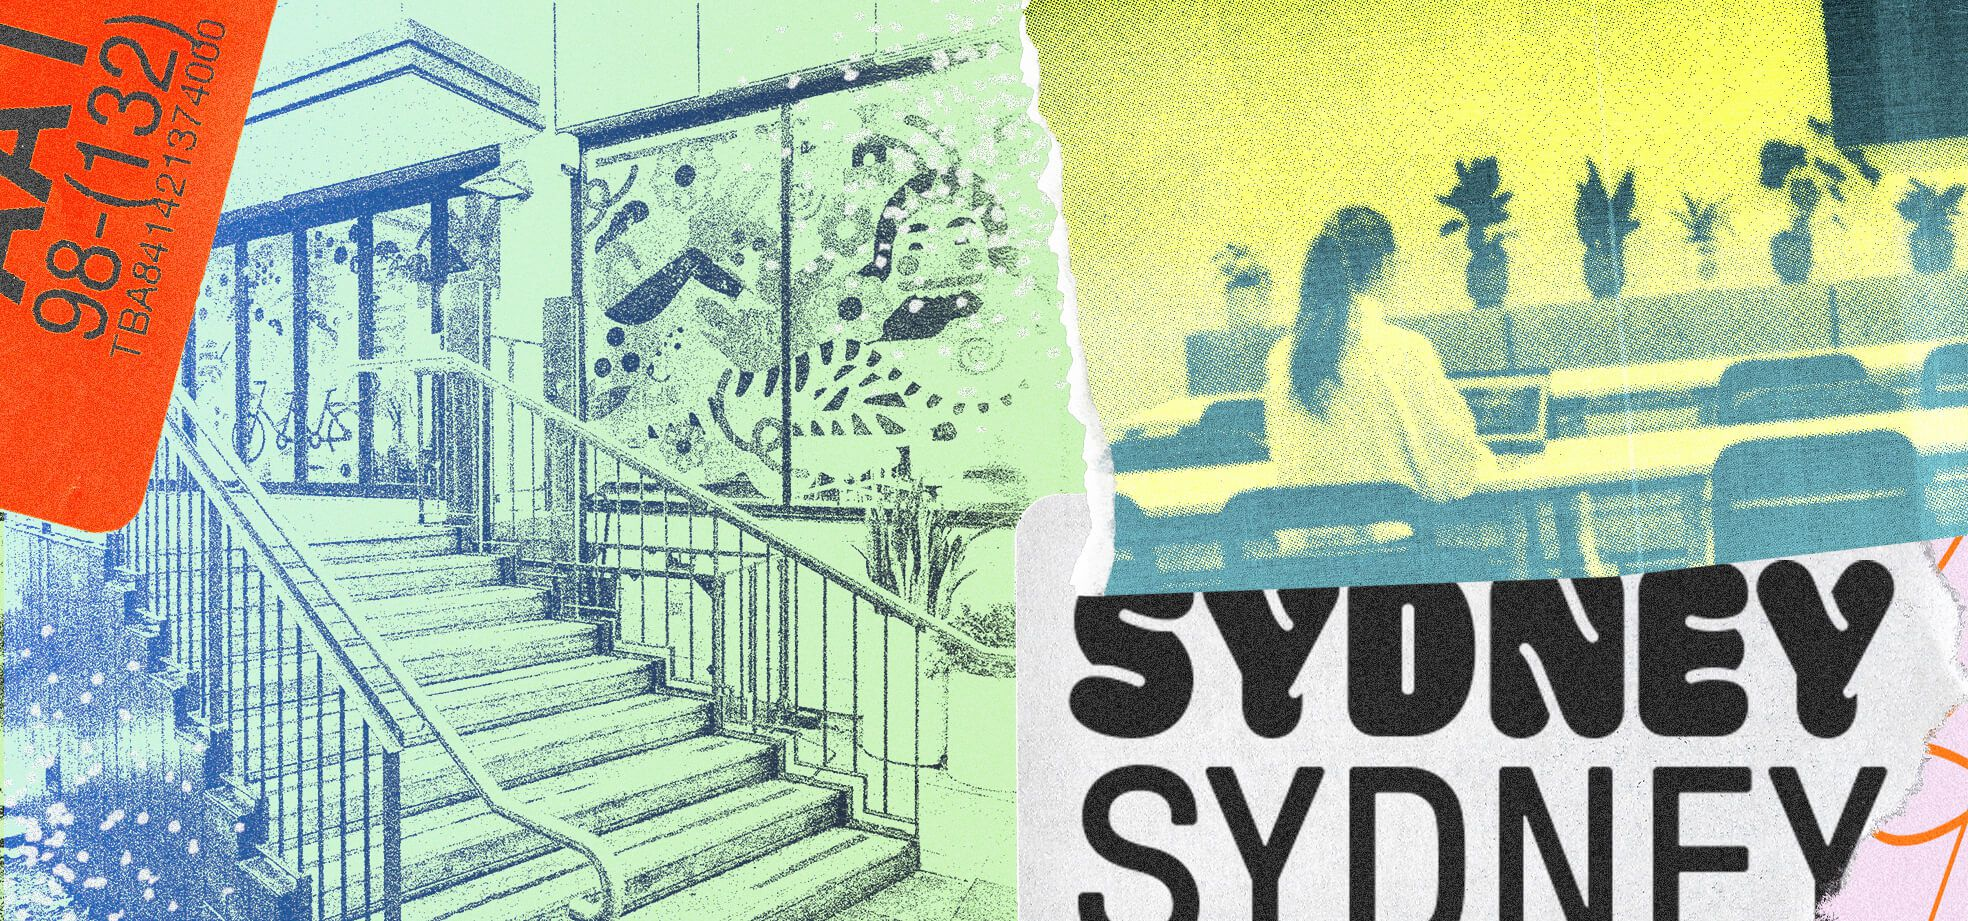 Intercom tour: Meet the Sydney office